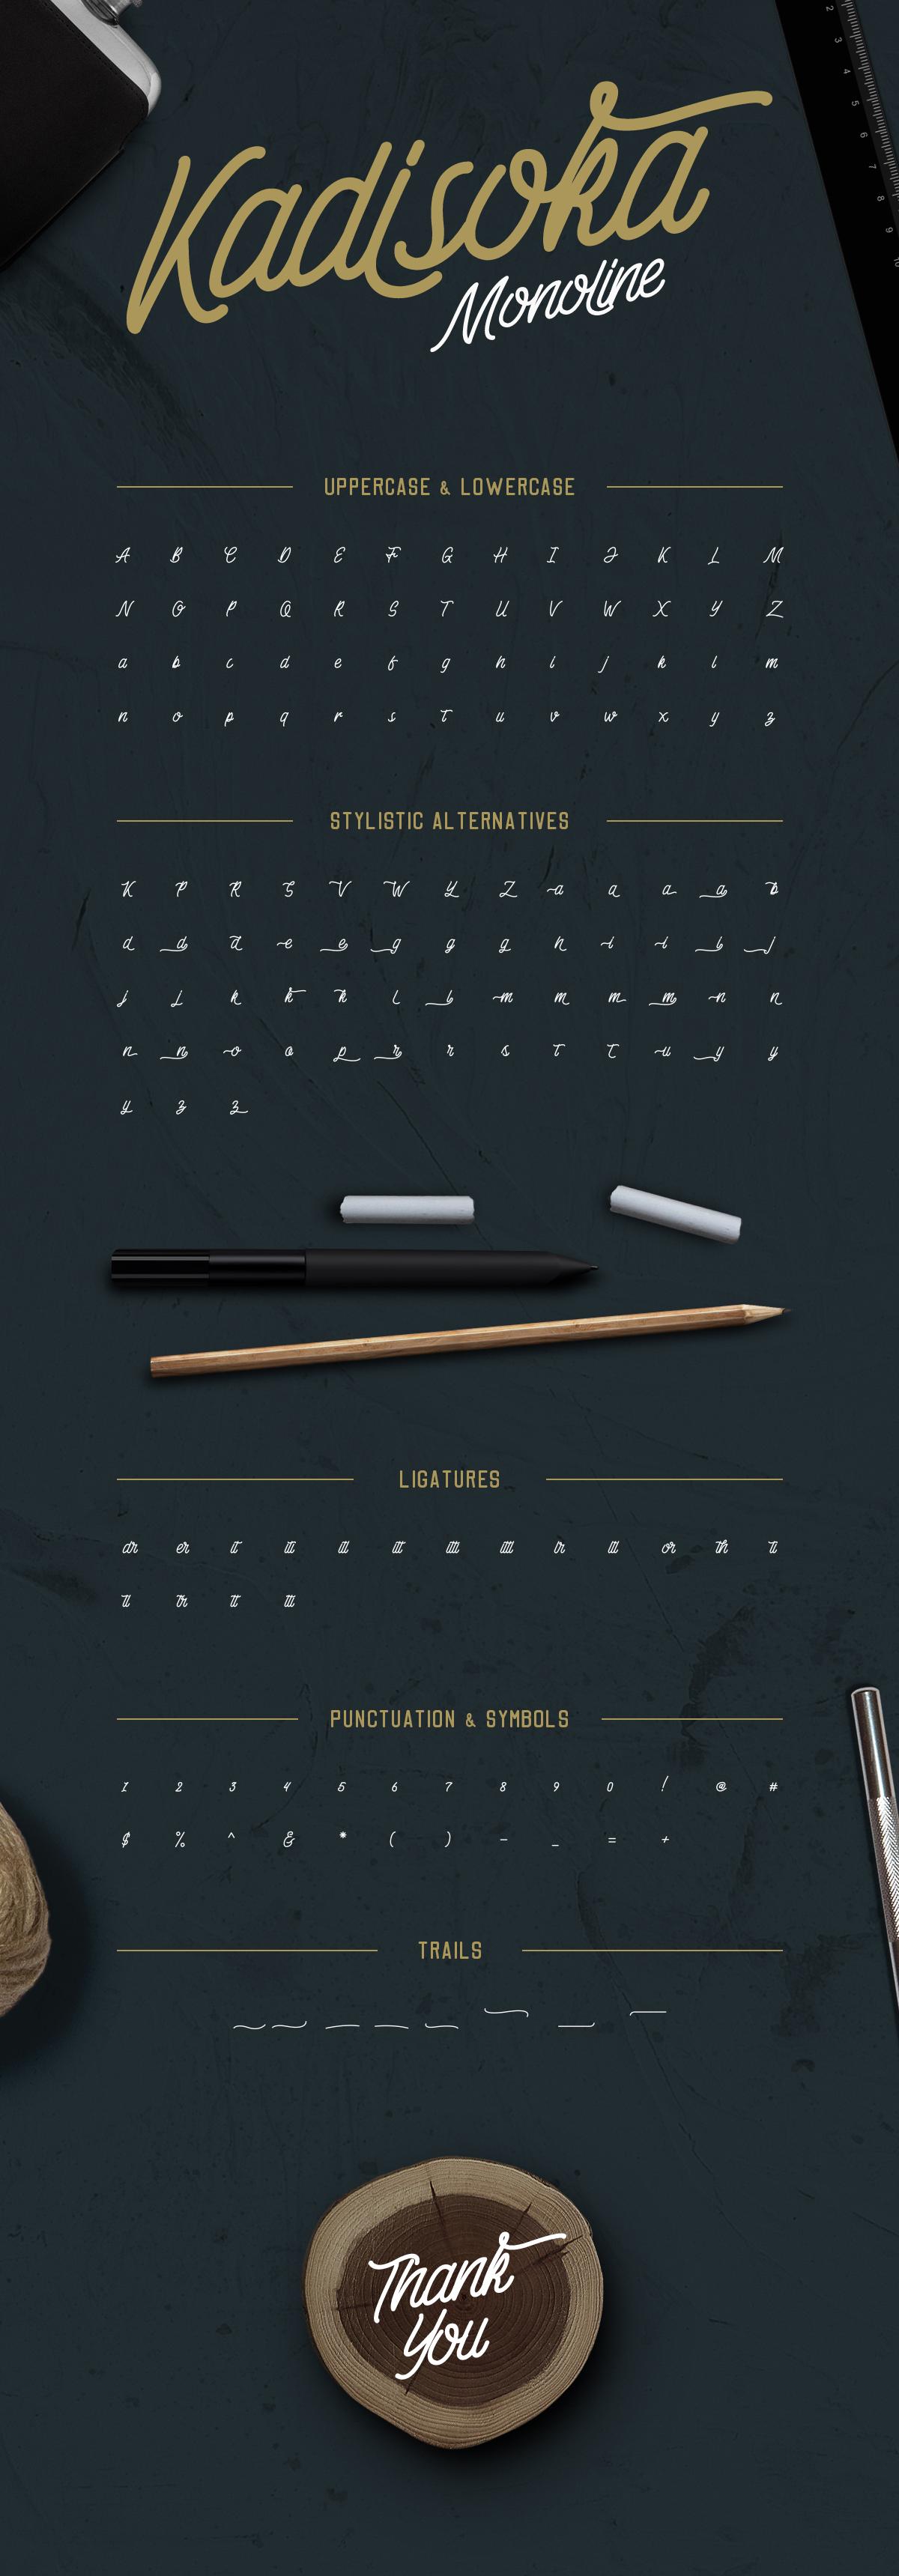 kadisoka-monoline-font